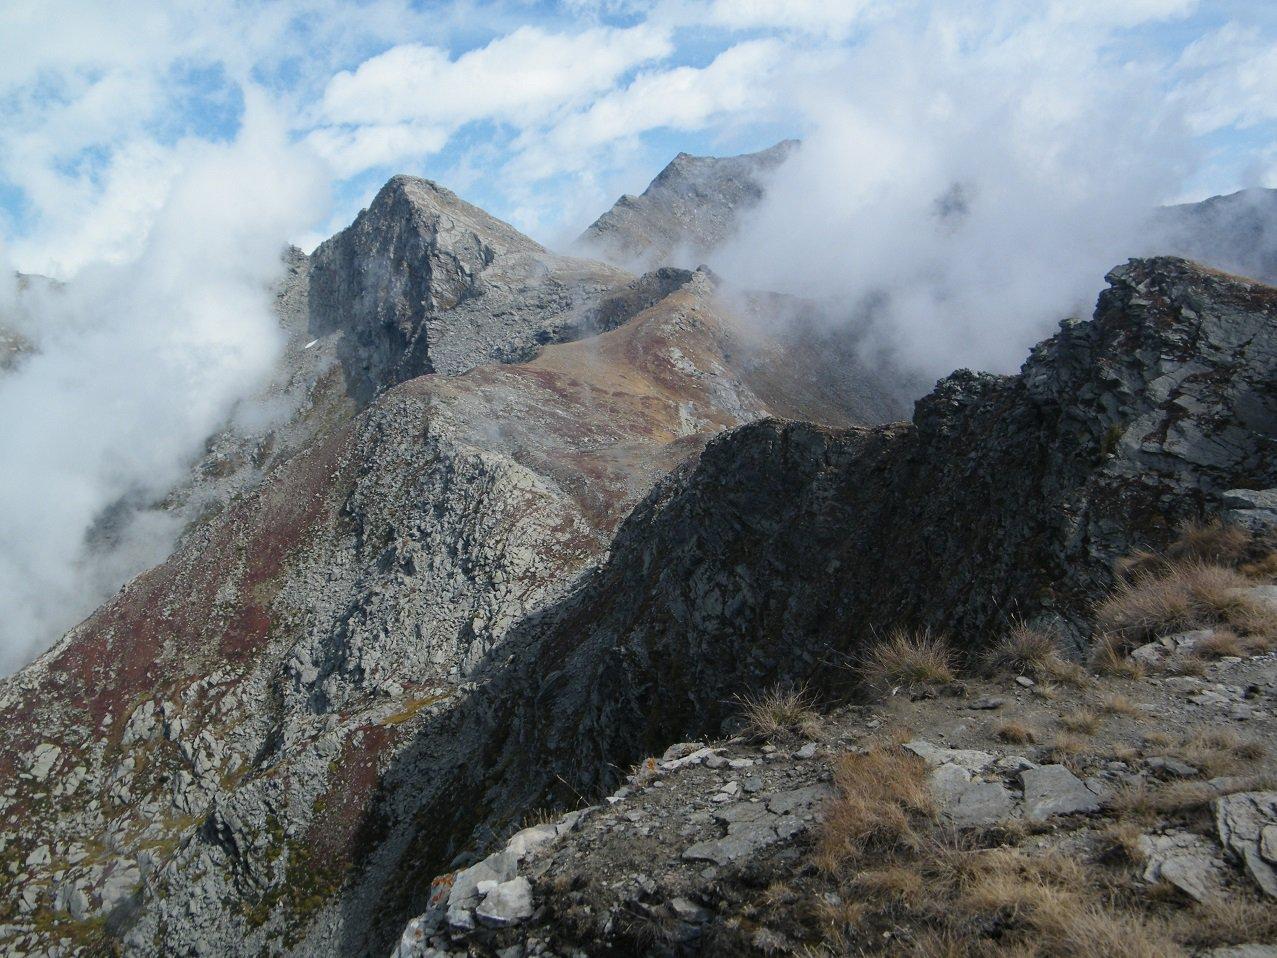 P.ta Founset vista dal Cappello d'Envie.